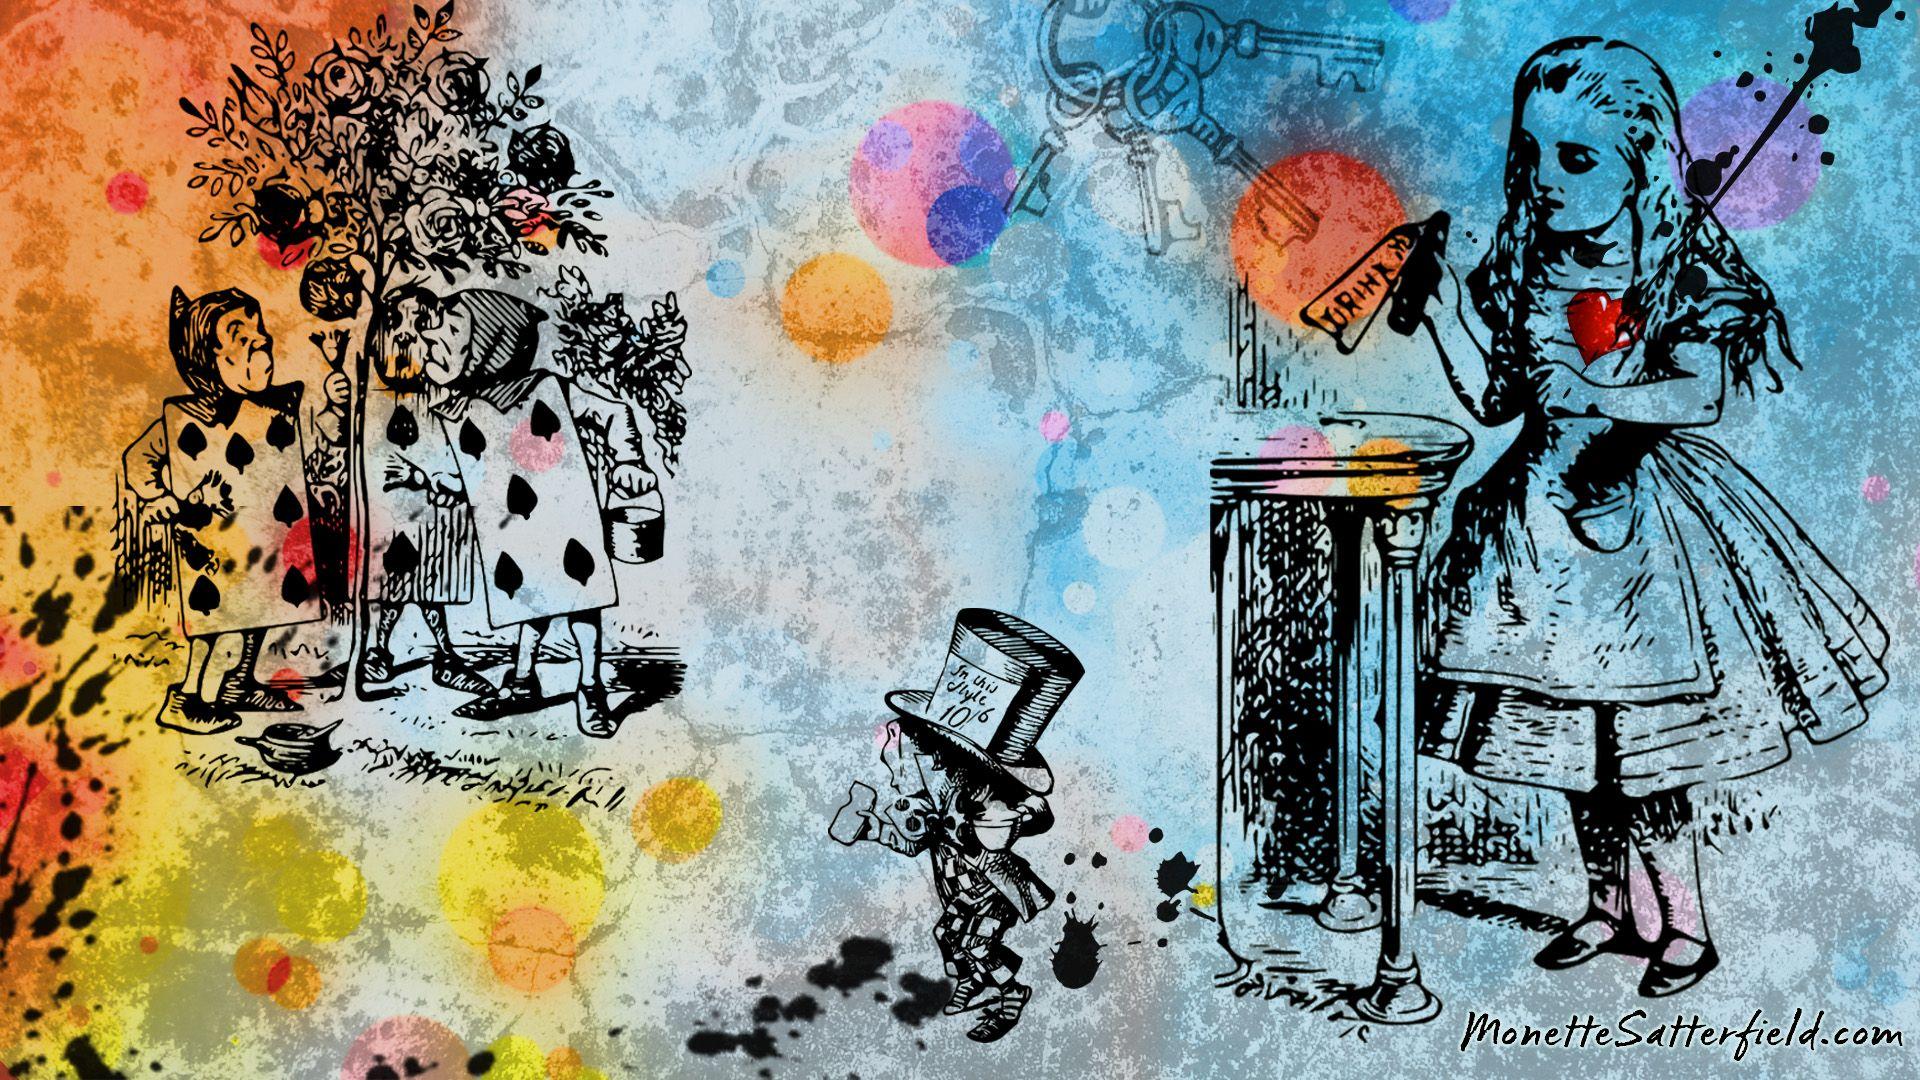 Pin By Joshlyn Epperson On Alice In Wonderland Desktop Wallpaper Art Alice In Wonderland Art Wallpaper